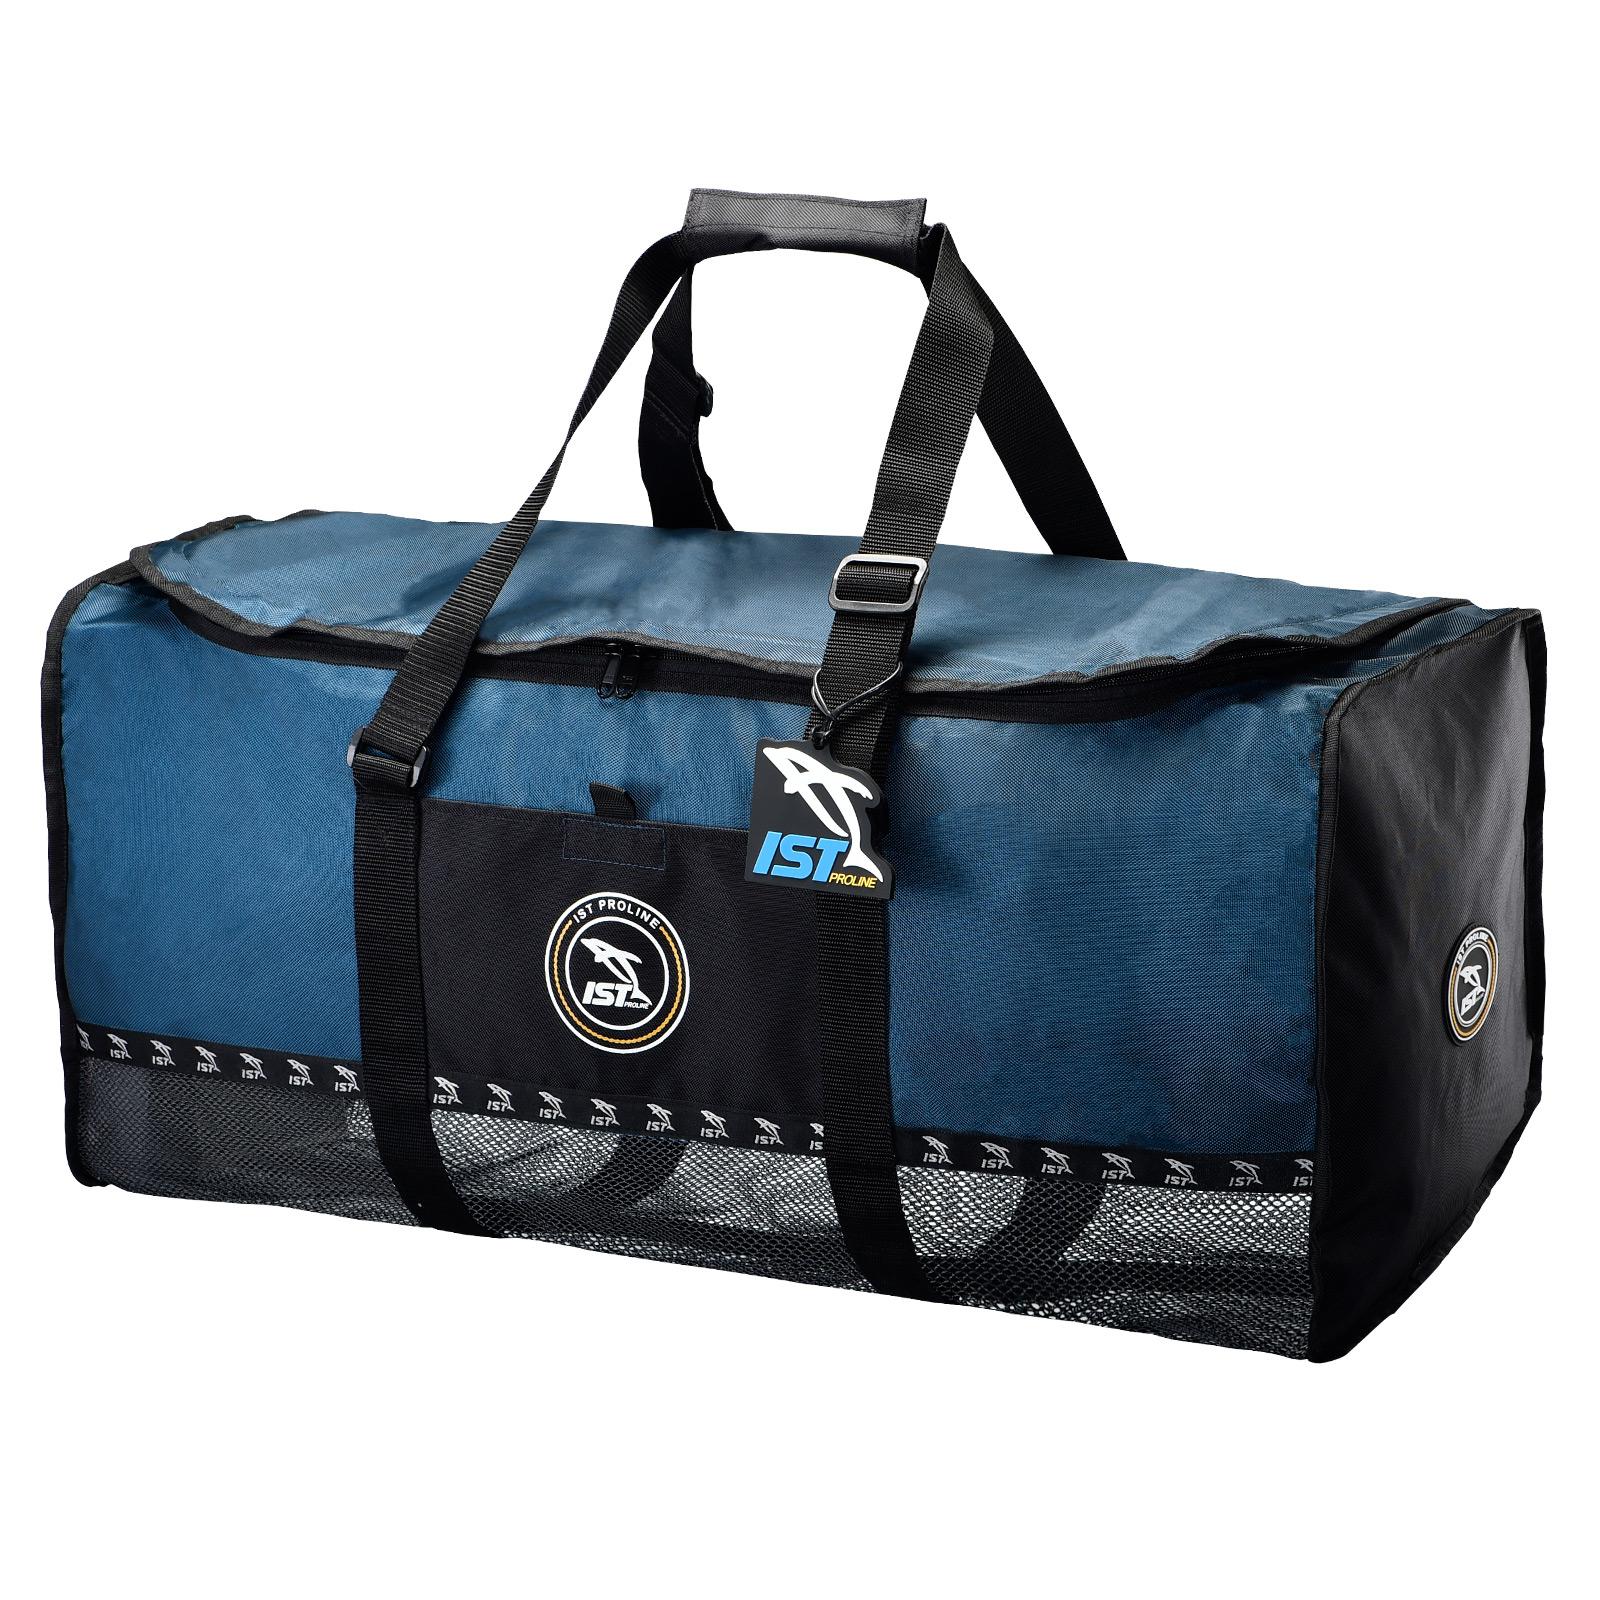 U-Shaped Mesh Bag